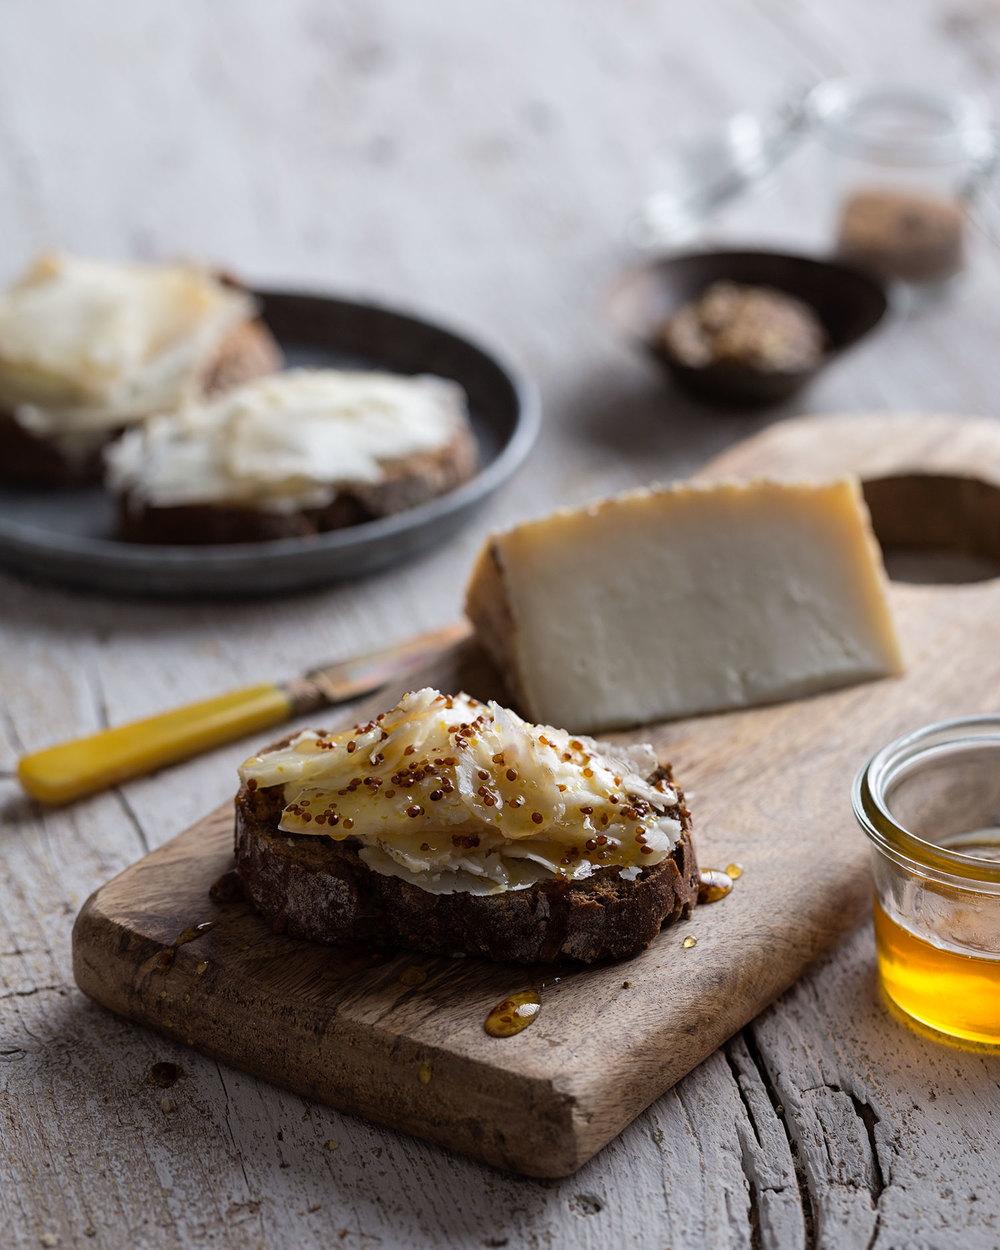 corina-landa-food-photography-fotografia-gastronomica-64.jpg